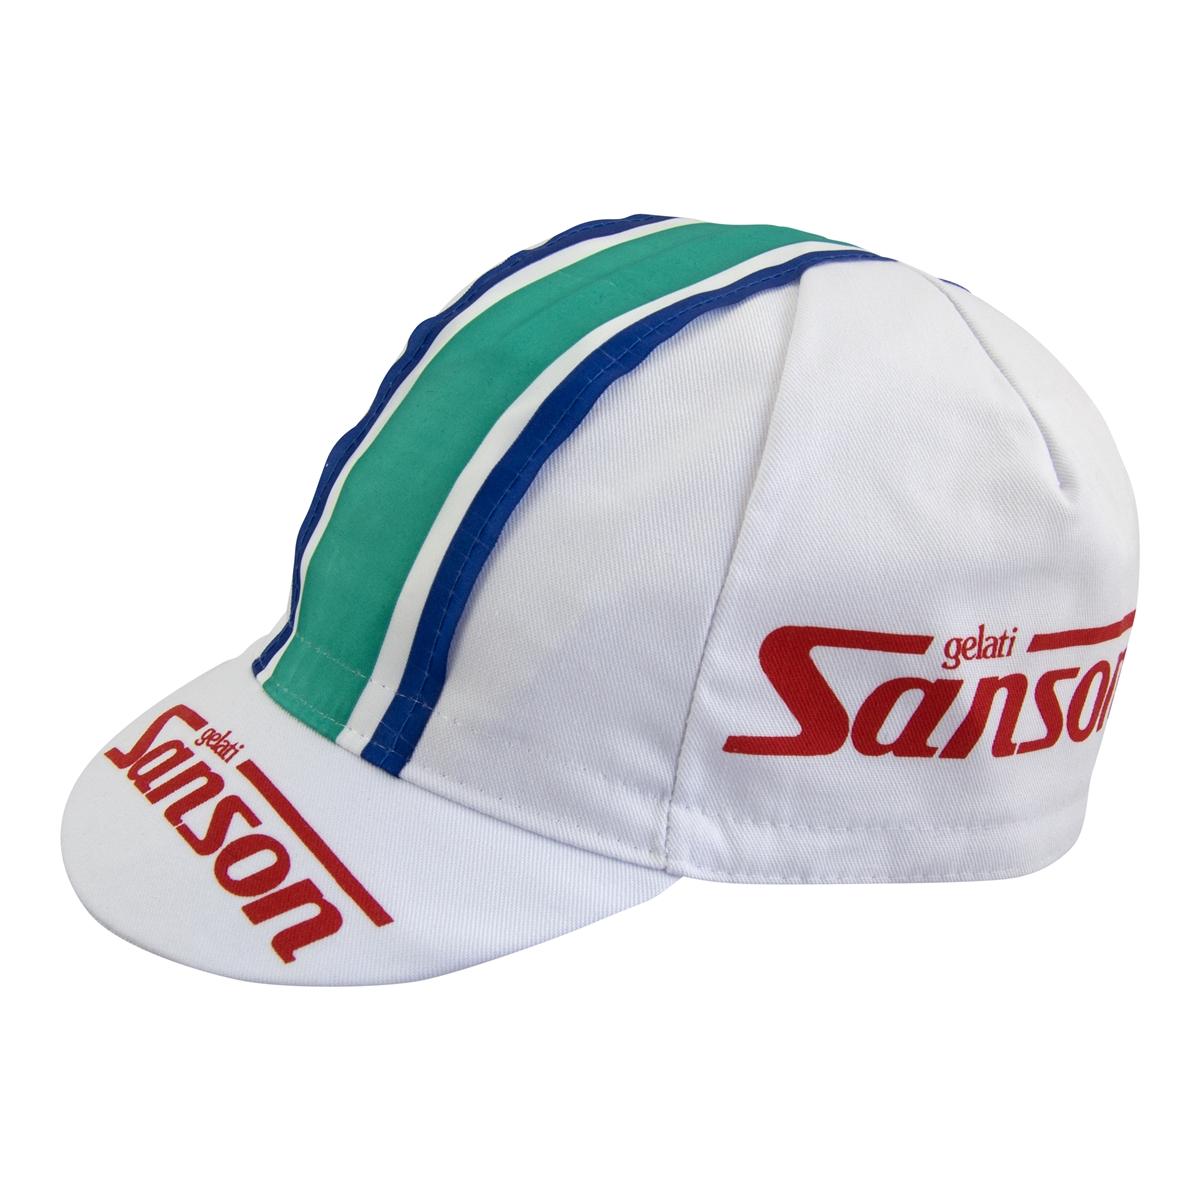 Sanson Pro Pro Team Cycling Cap 35b4ec42f